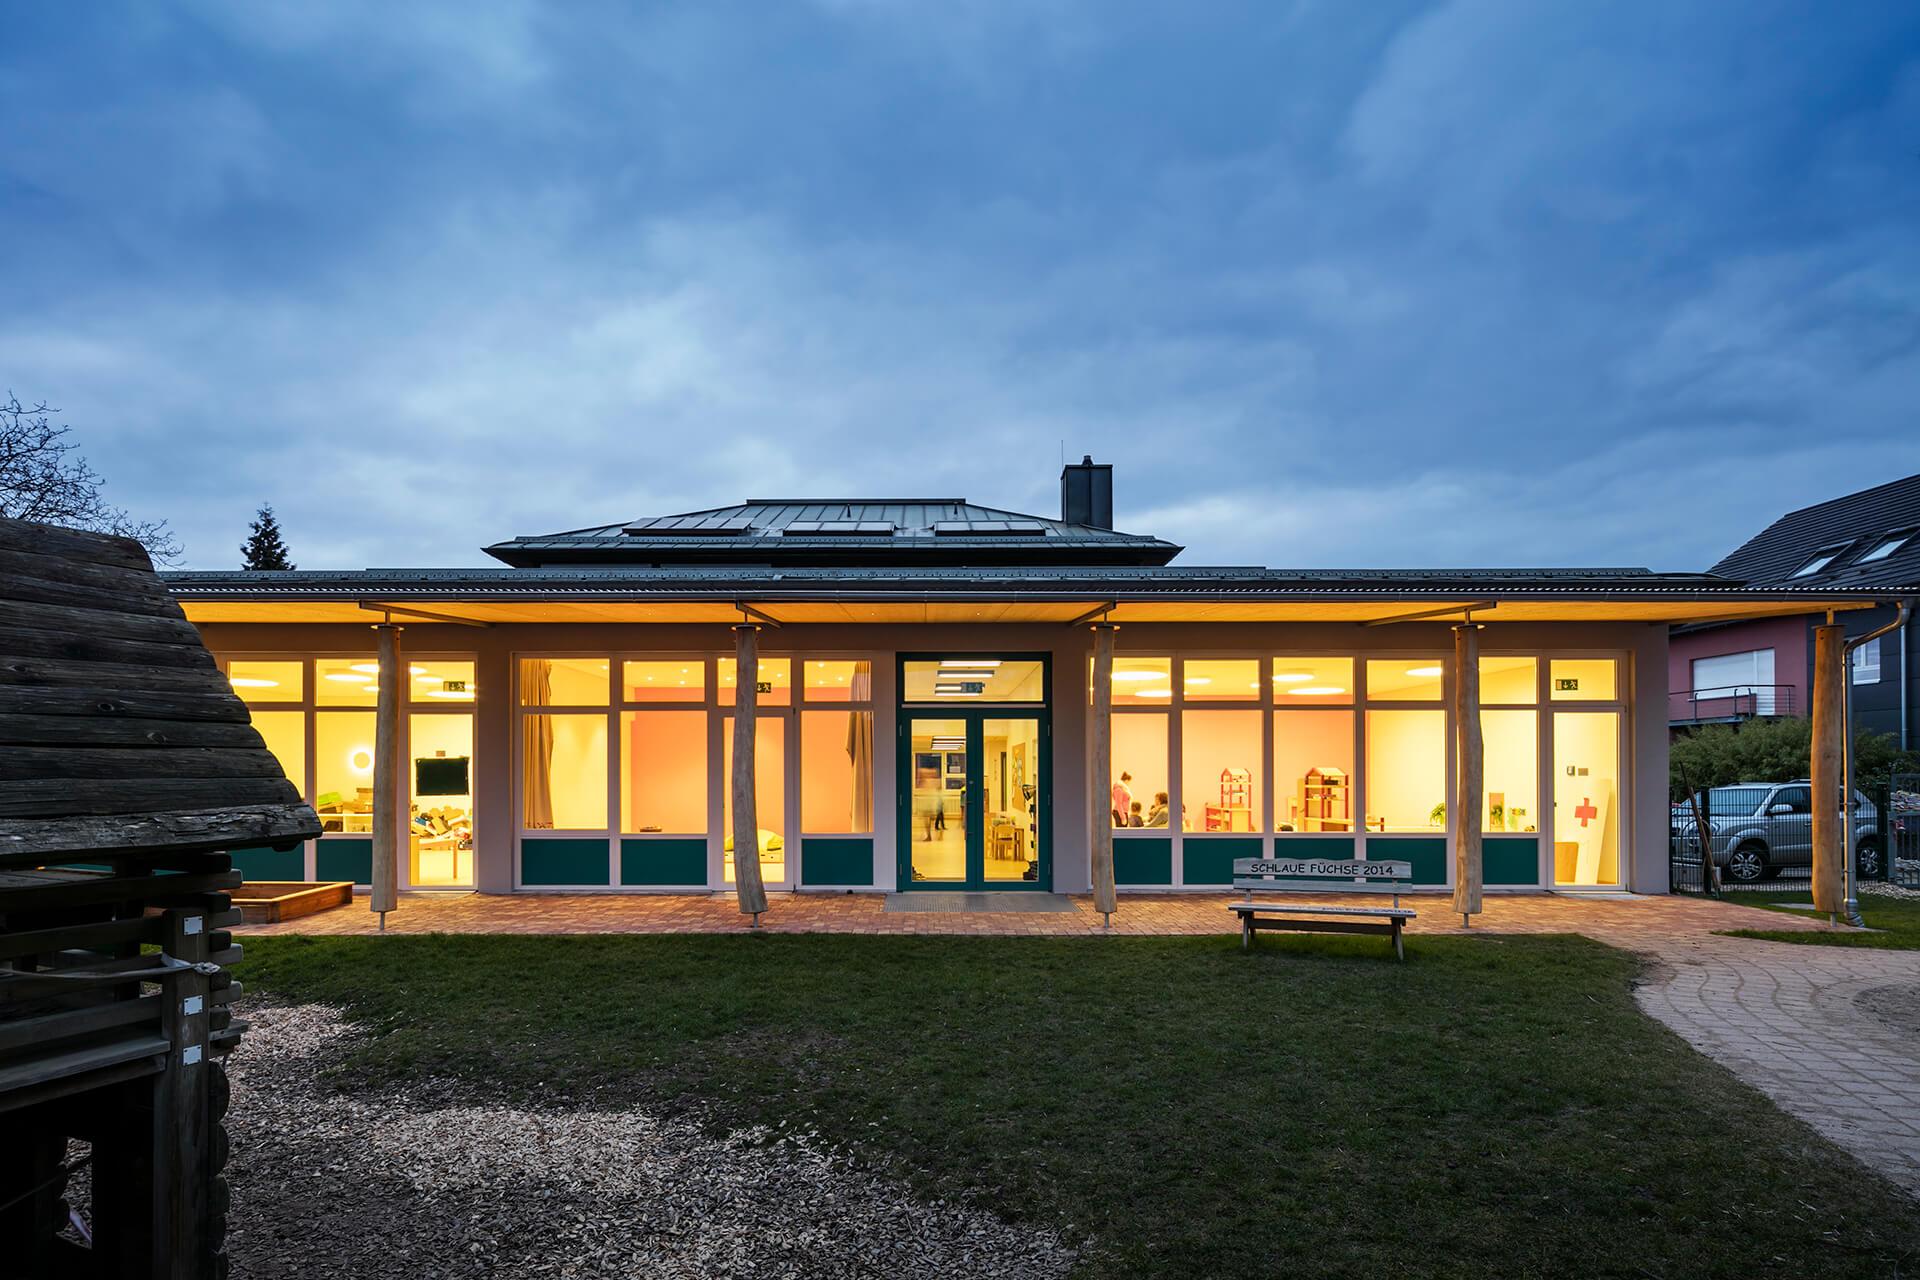 Kindergarten St. Raphael Ettlingen Oberweier